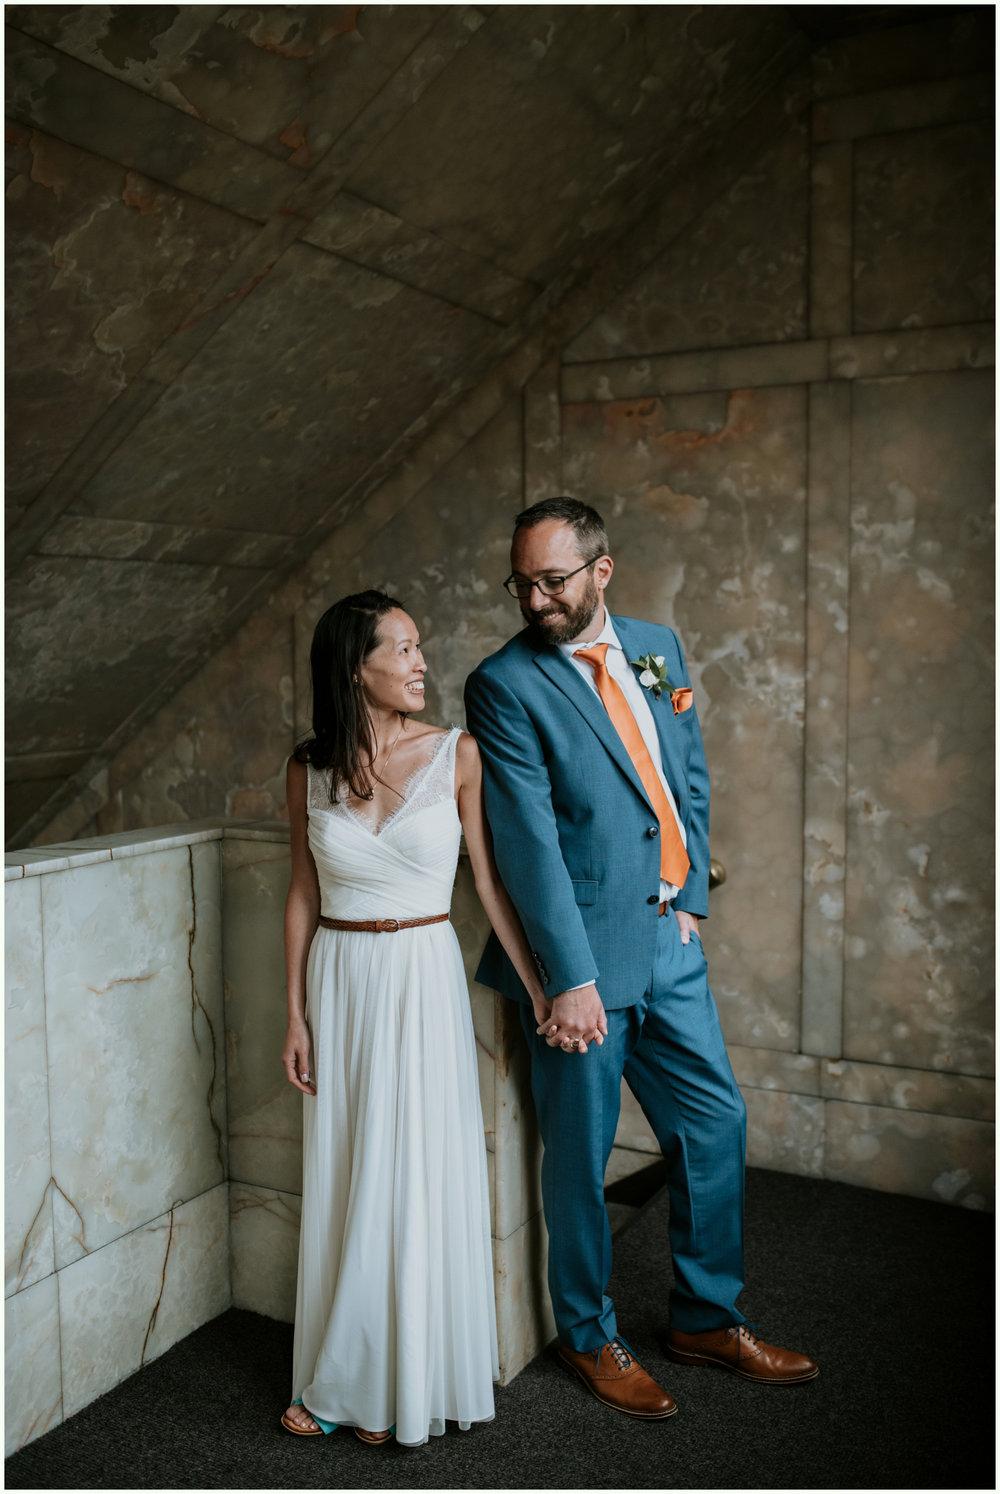 within-sodo-june-wedding-seattle-photographer-caitlyn-nikula-43.jpg